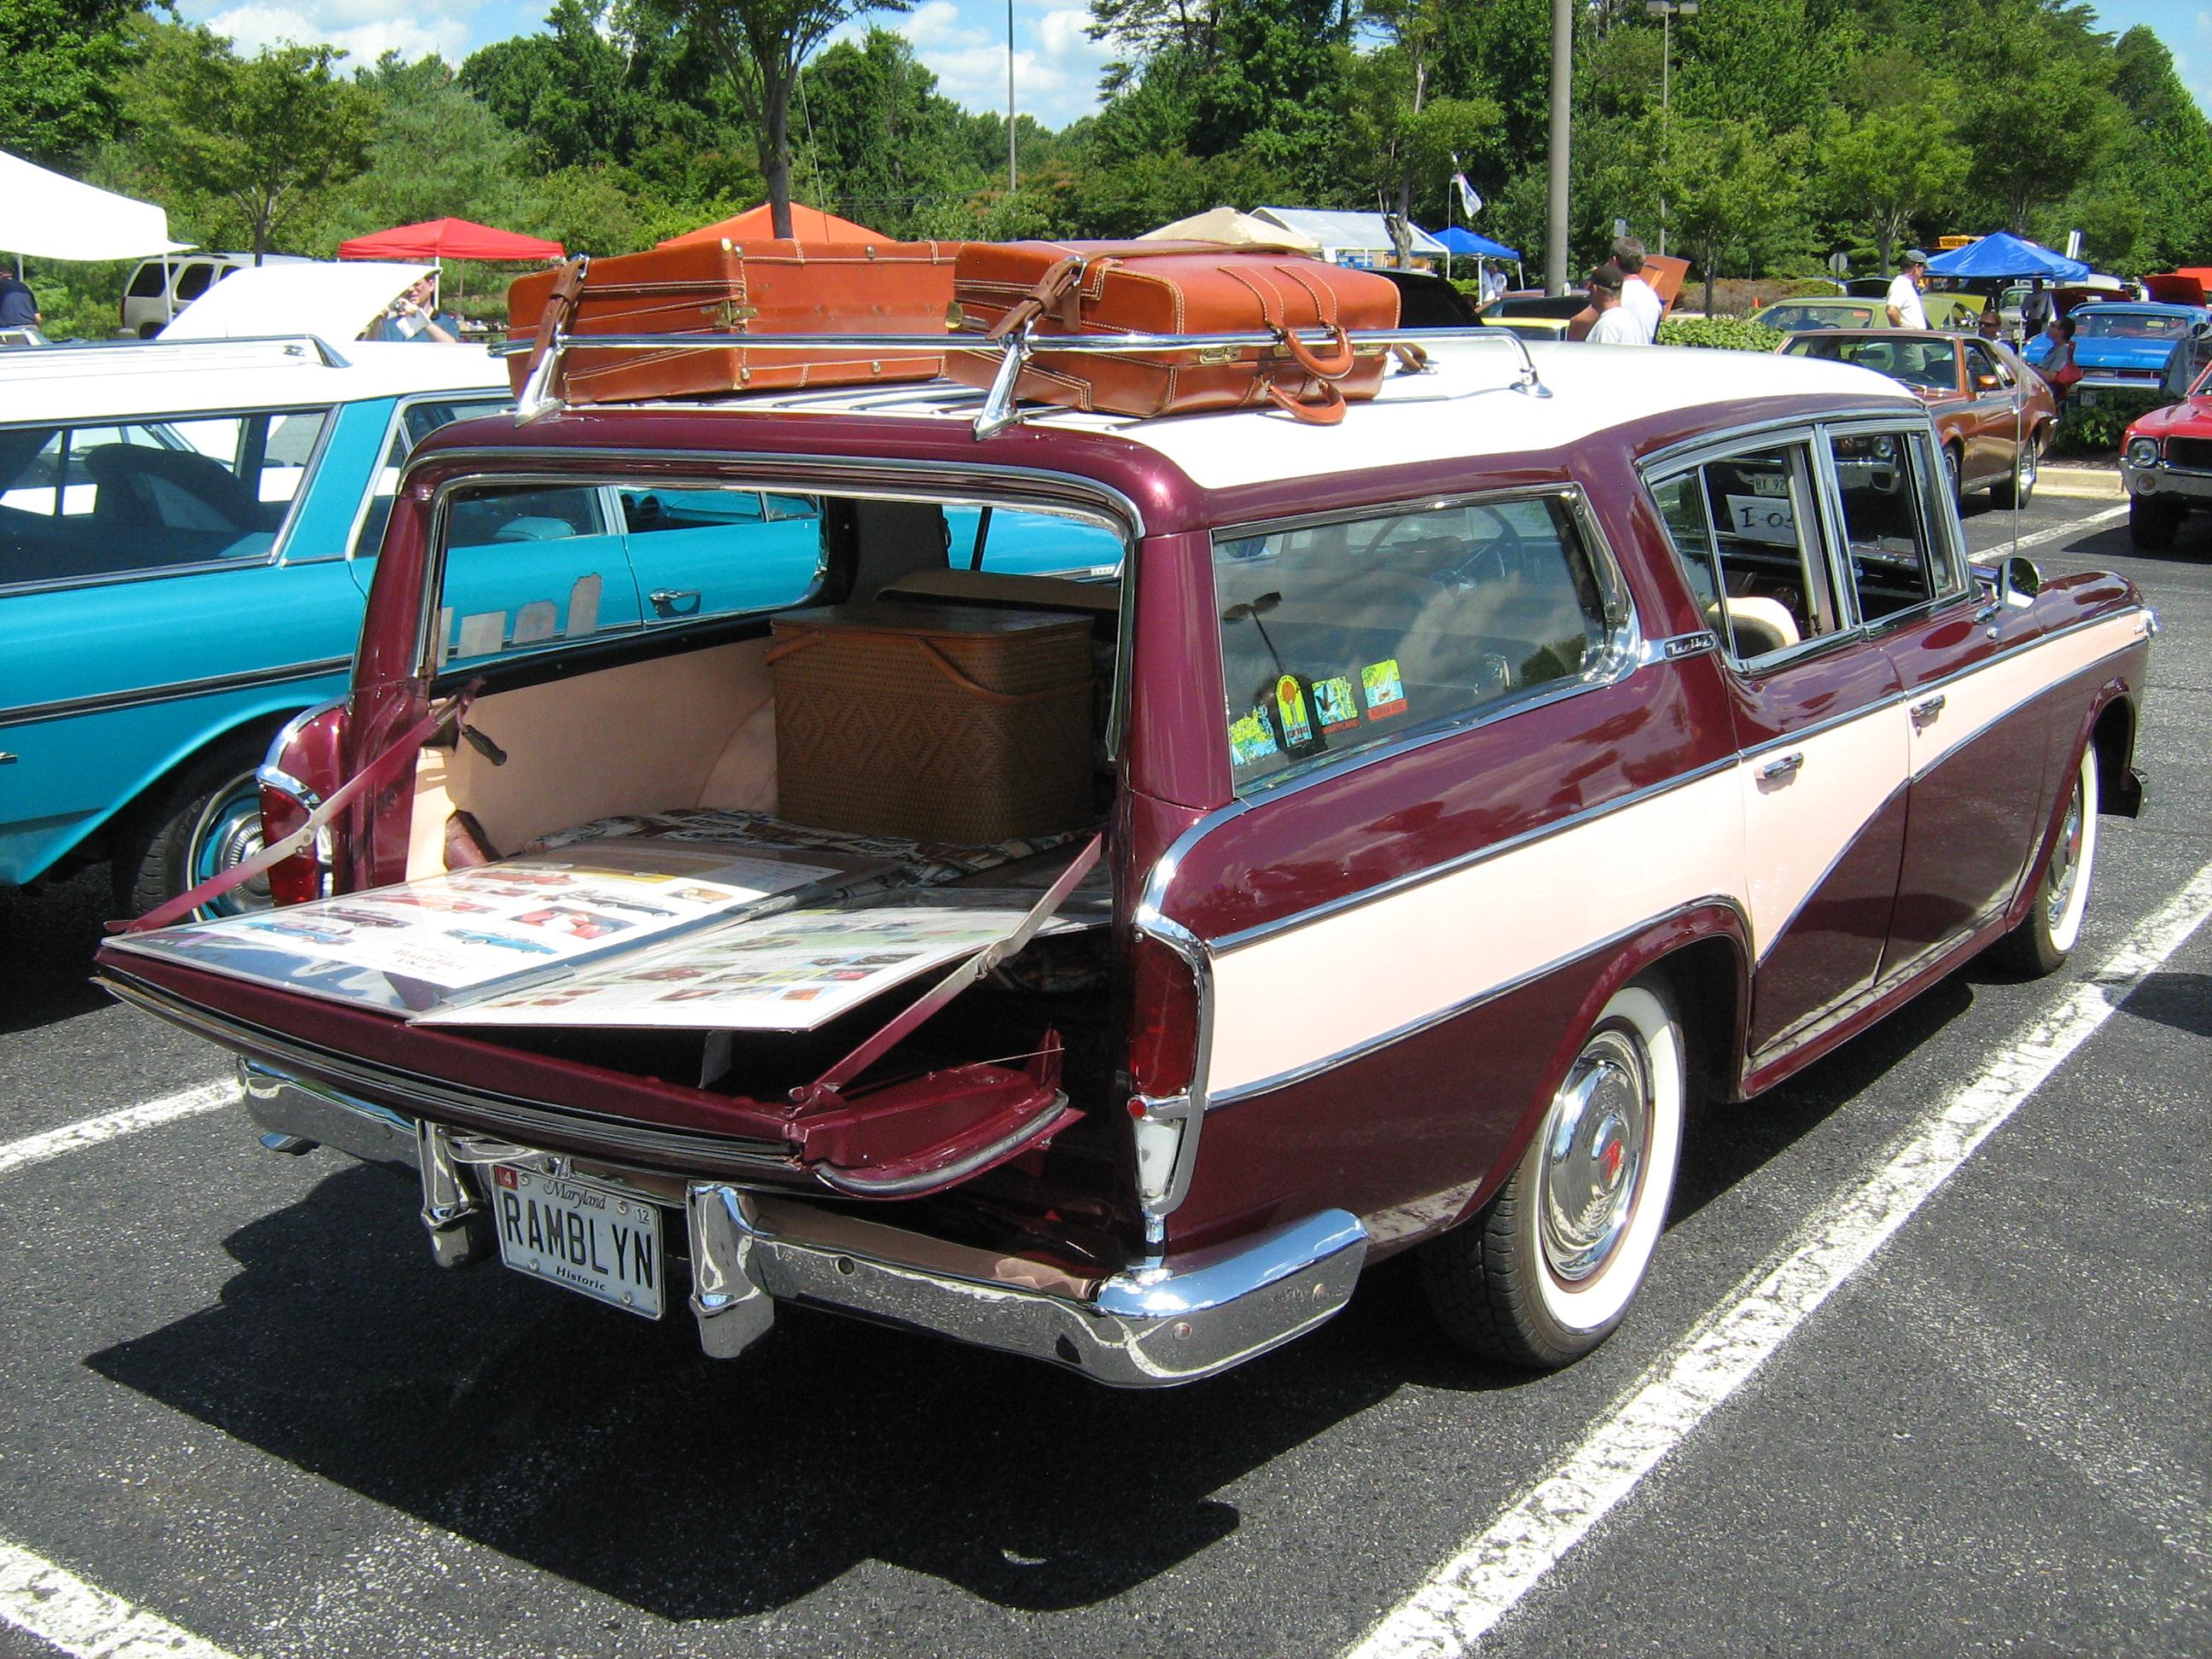 file 1957 rambler custom cross country wagon annmd. Black Bedroom Furniture Sets. Home Design Ideas